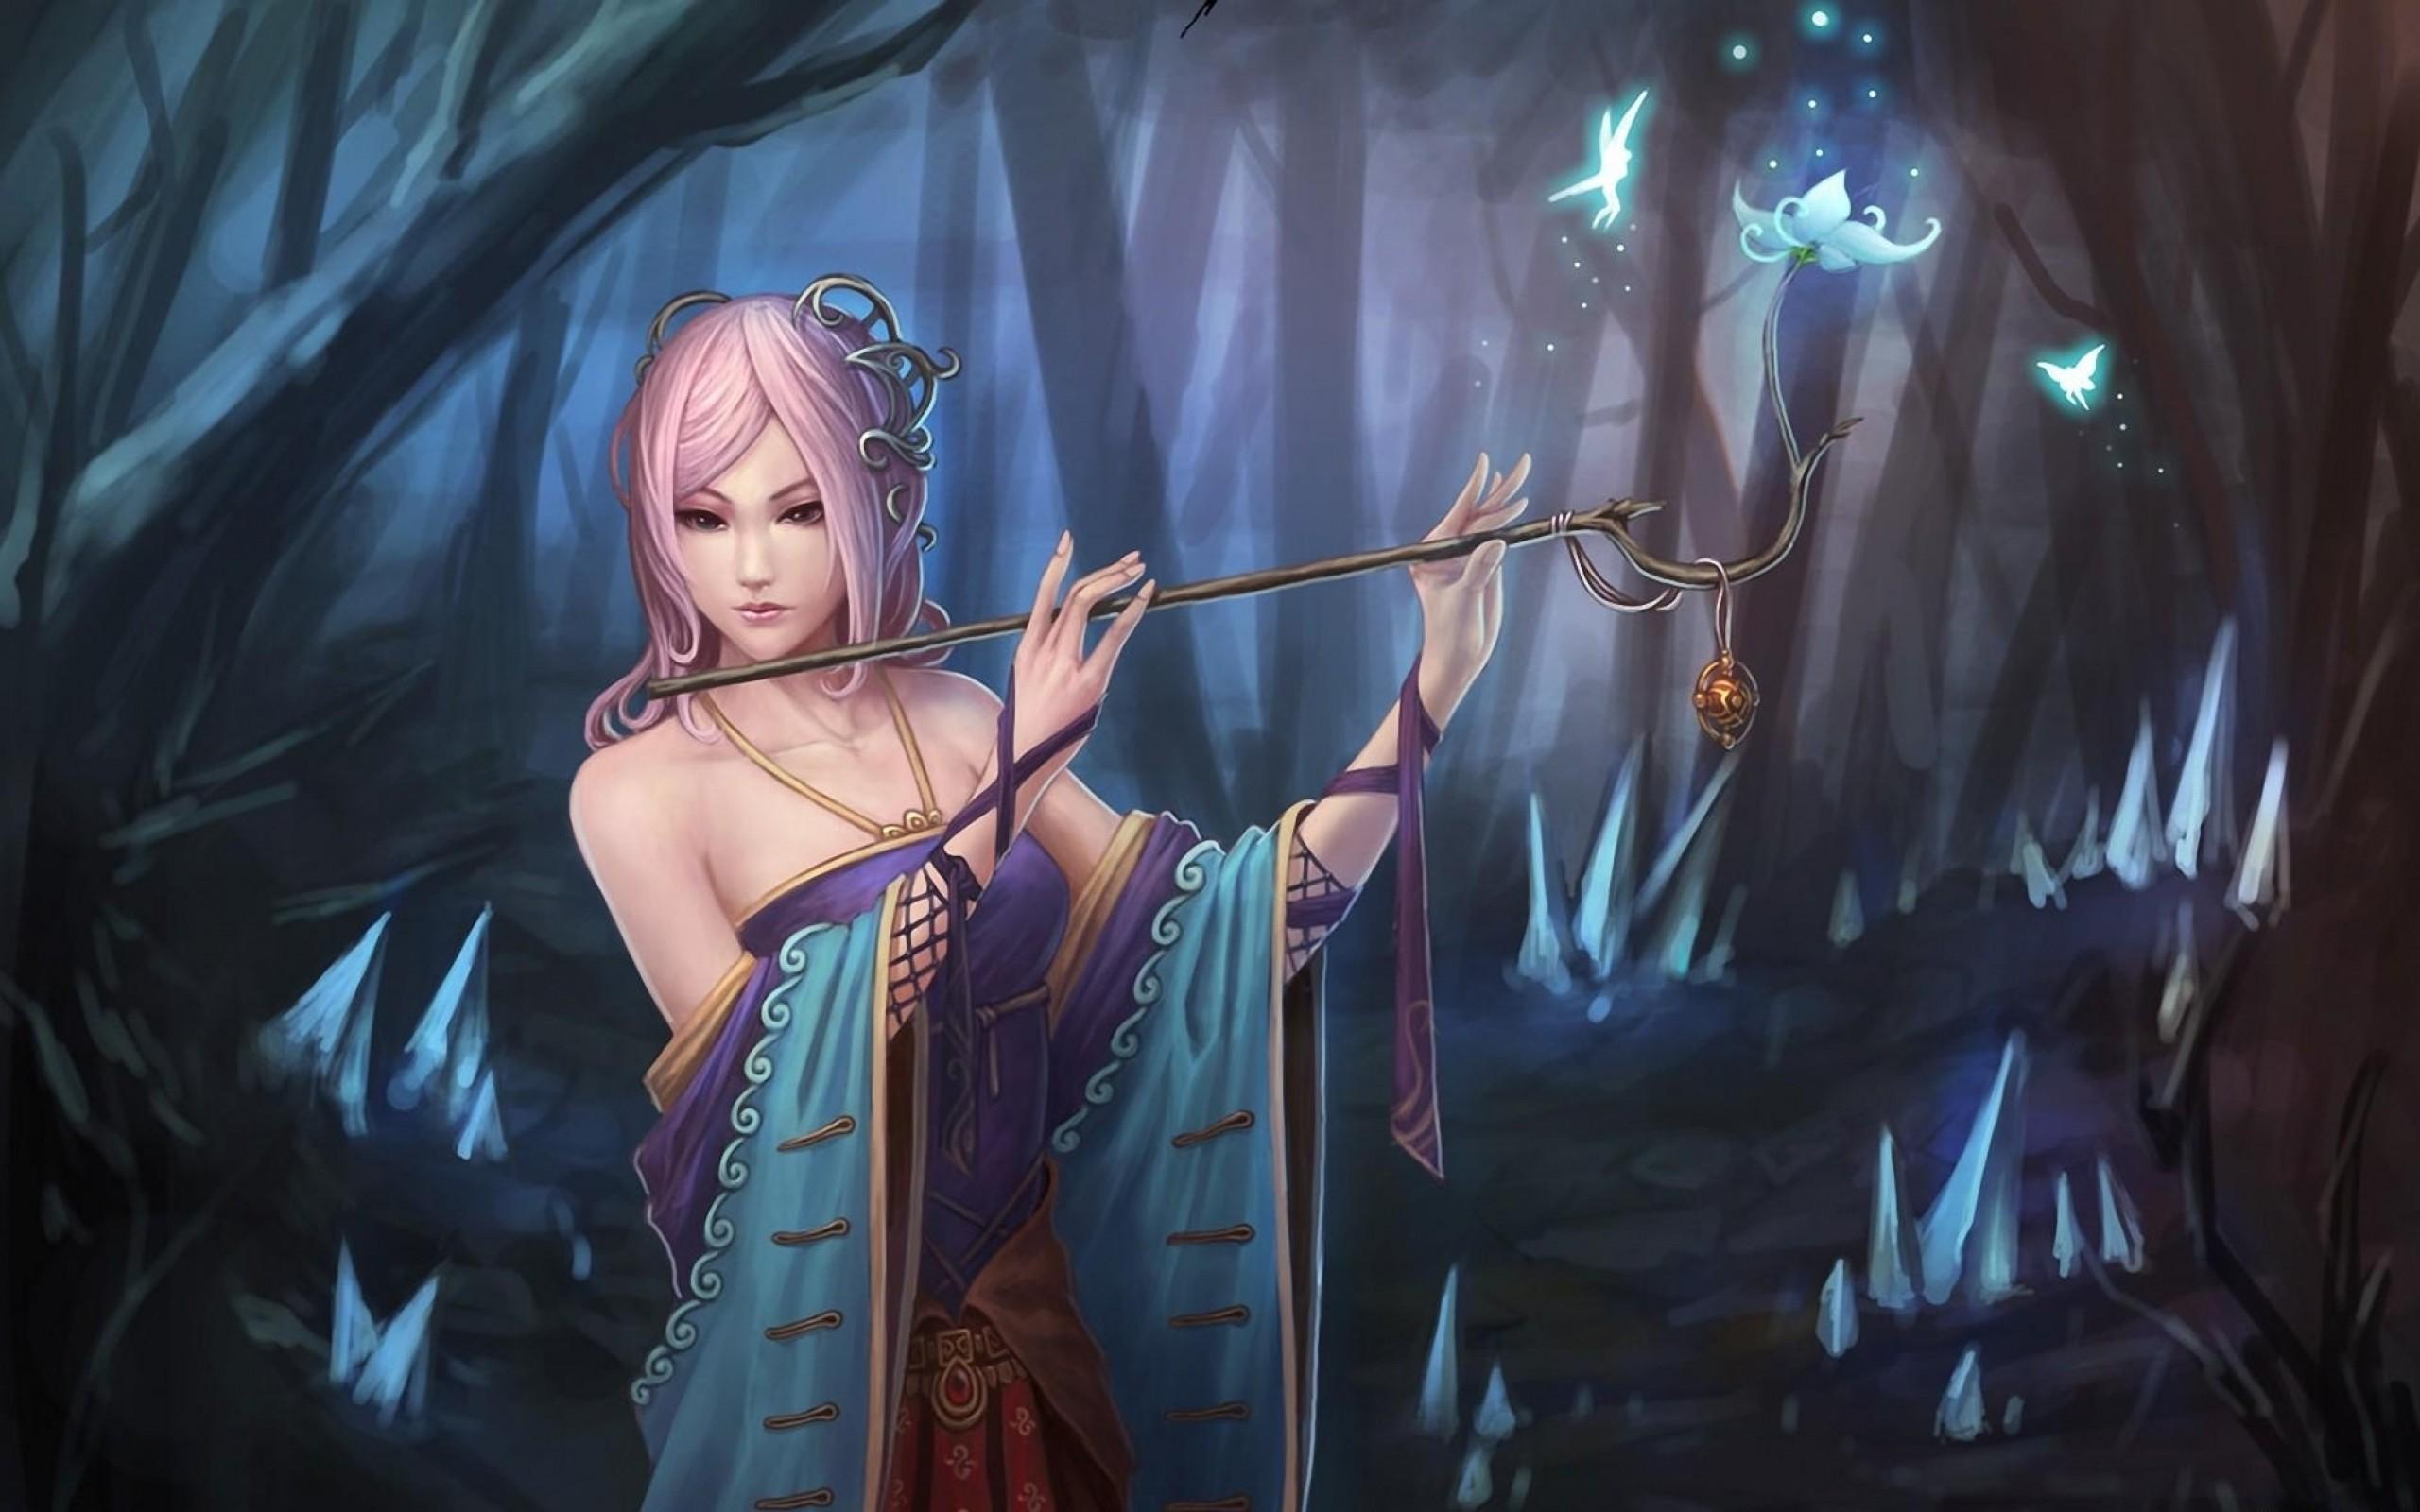 Druid girl hot sexy photo